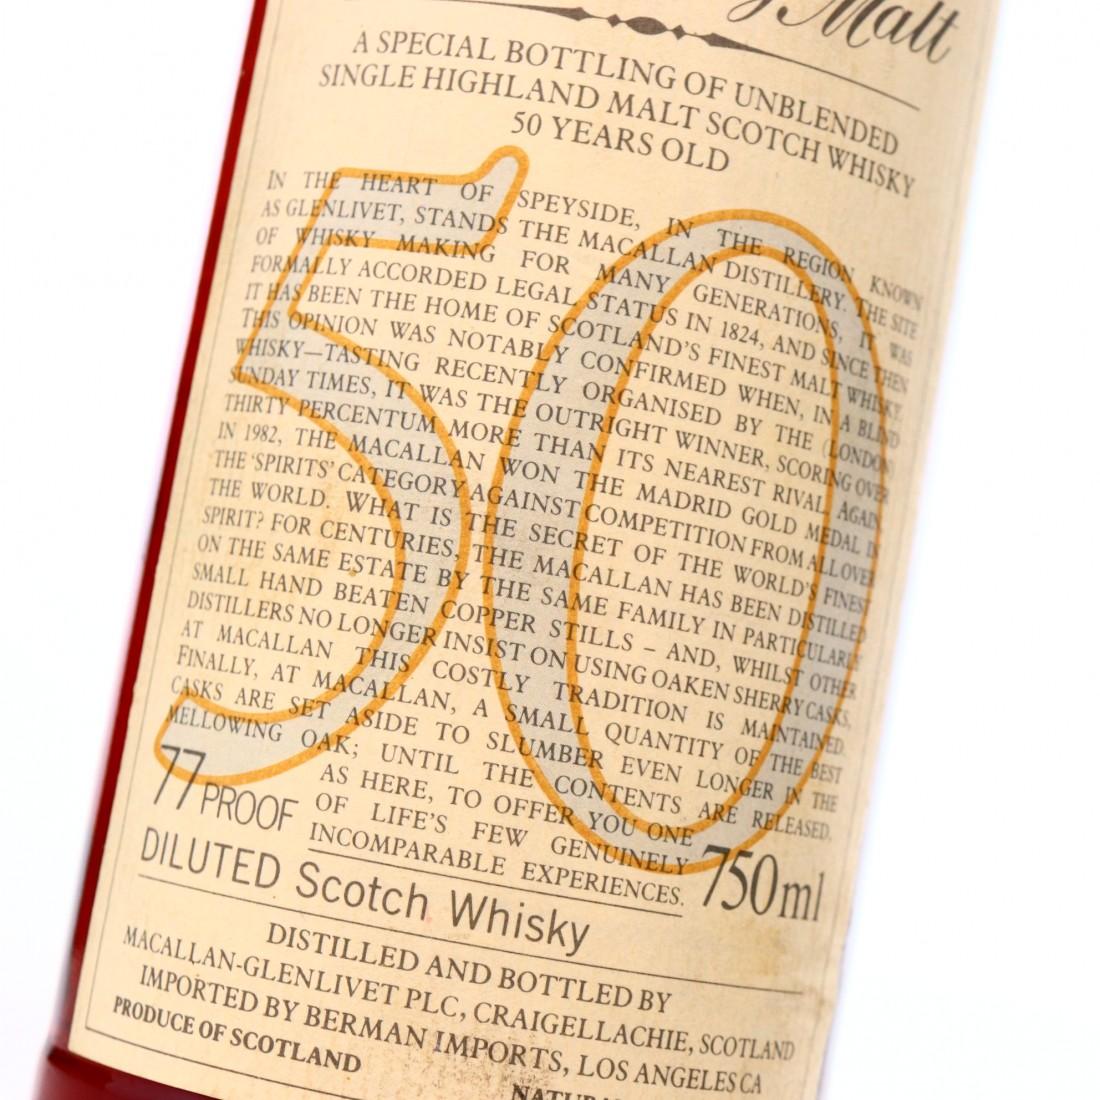 *Macallan 1928 Anniversary Malt 50 Year Old / Berman Import, US